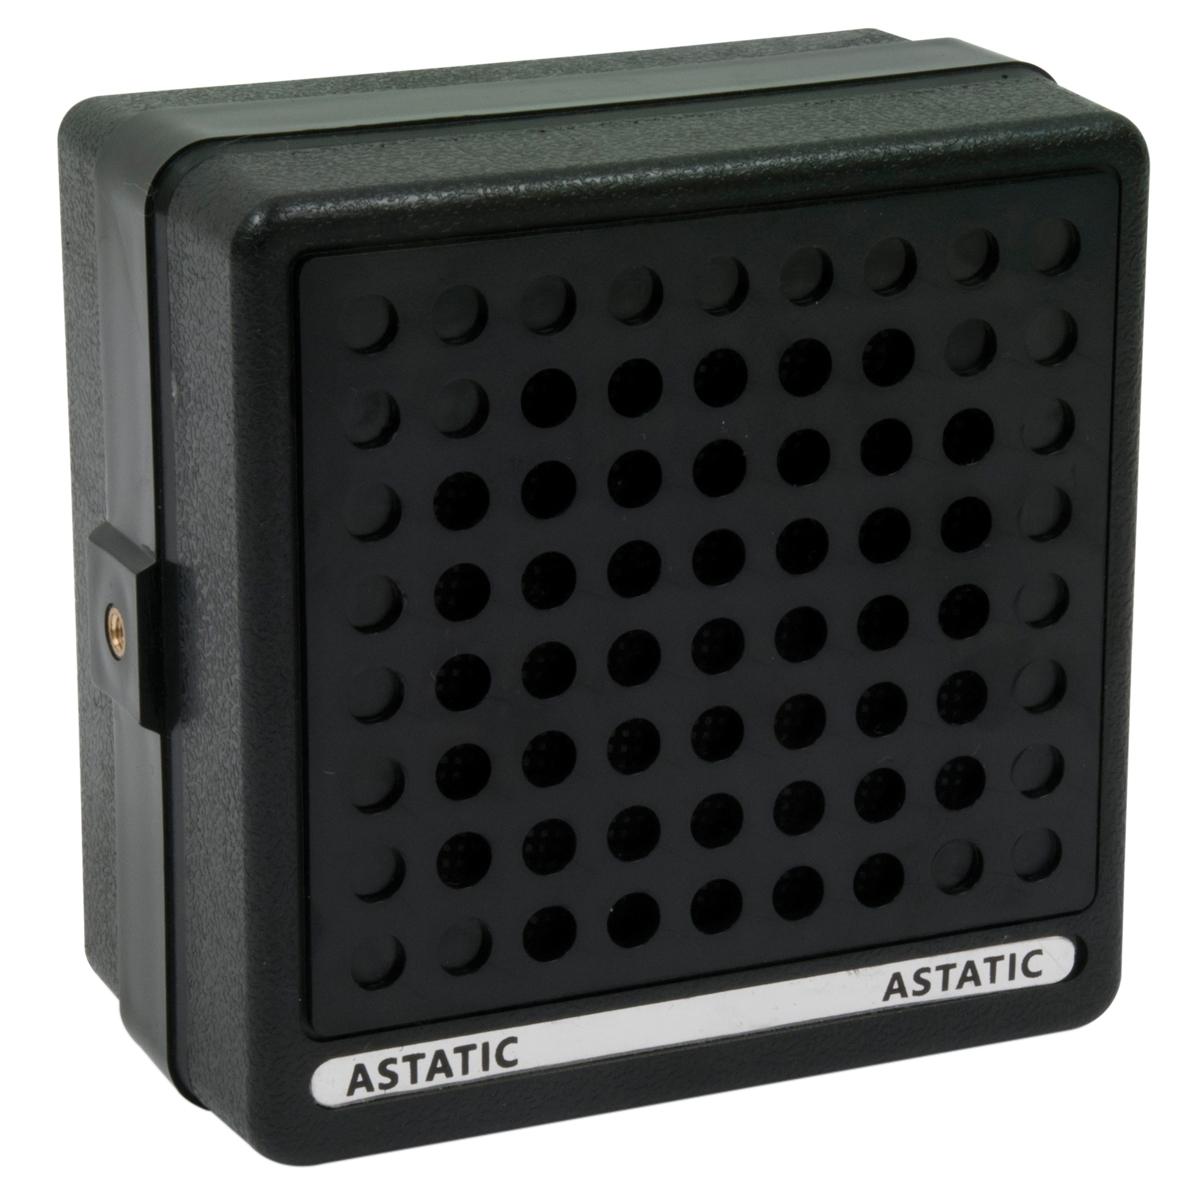 Astatic Cb External Speaker Presid 10Watts/8Ohms